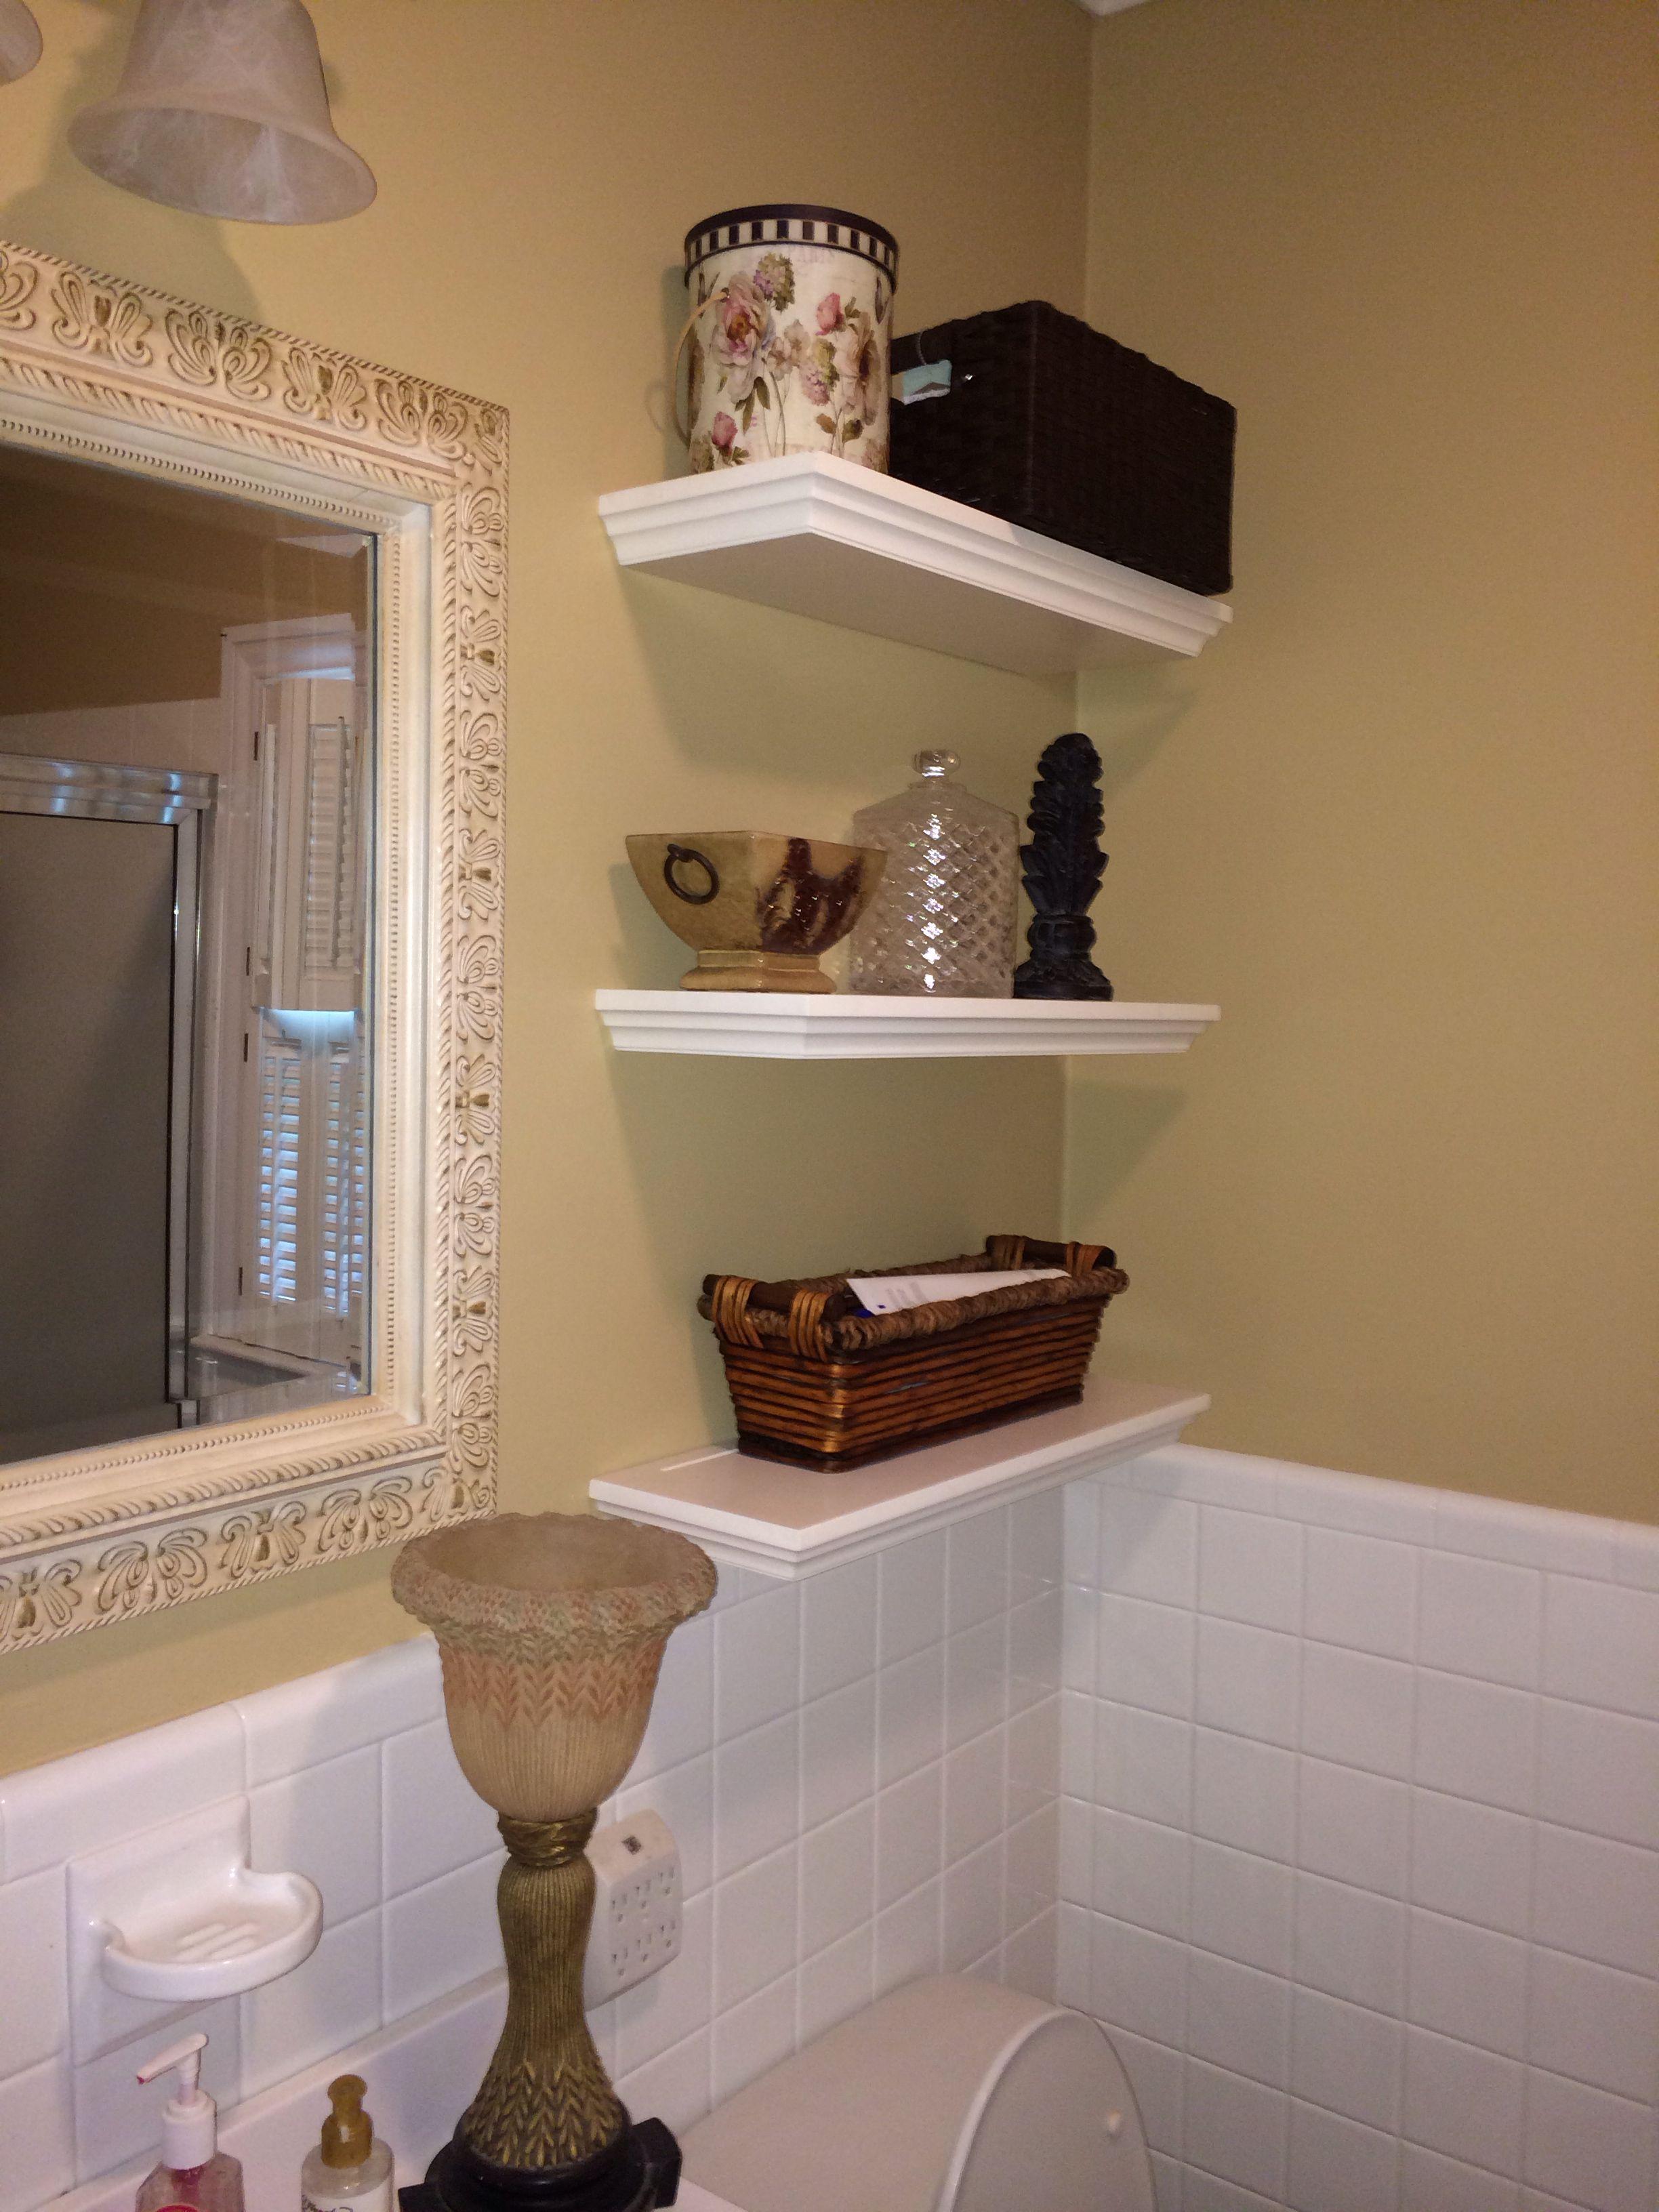 Small bathroom ideas | Bathroom wall coverings, Small ...